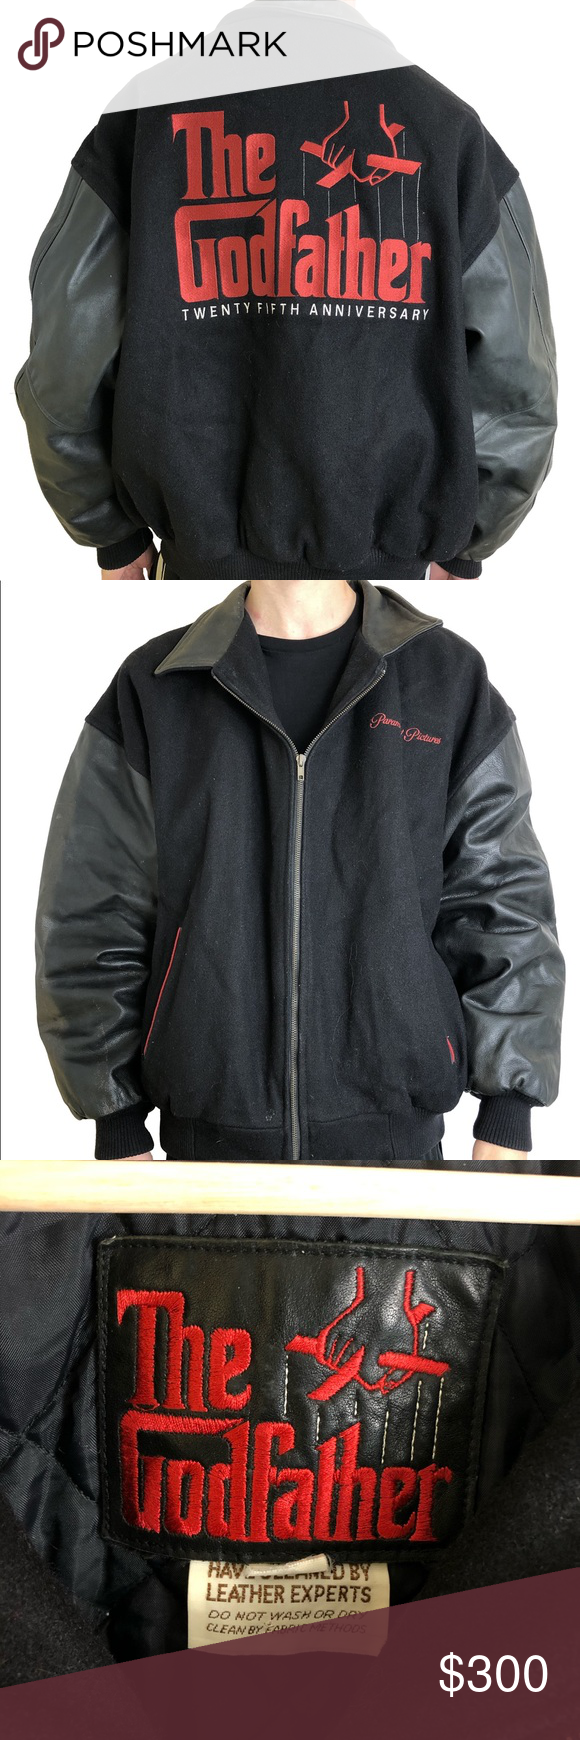 Godfather 25th Anniversary Letterman Jacket Coat